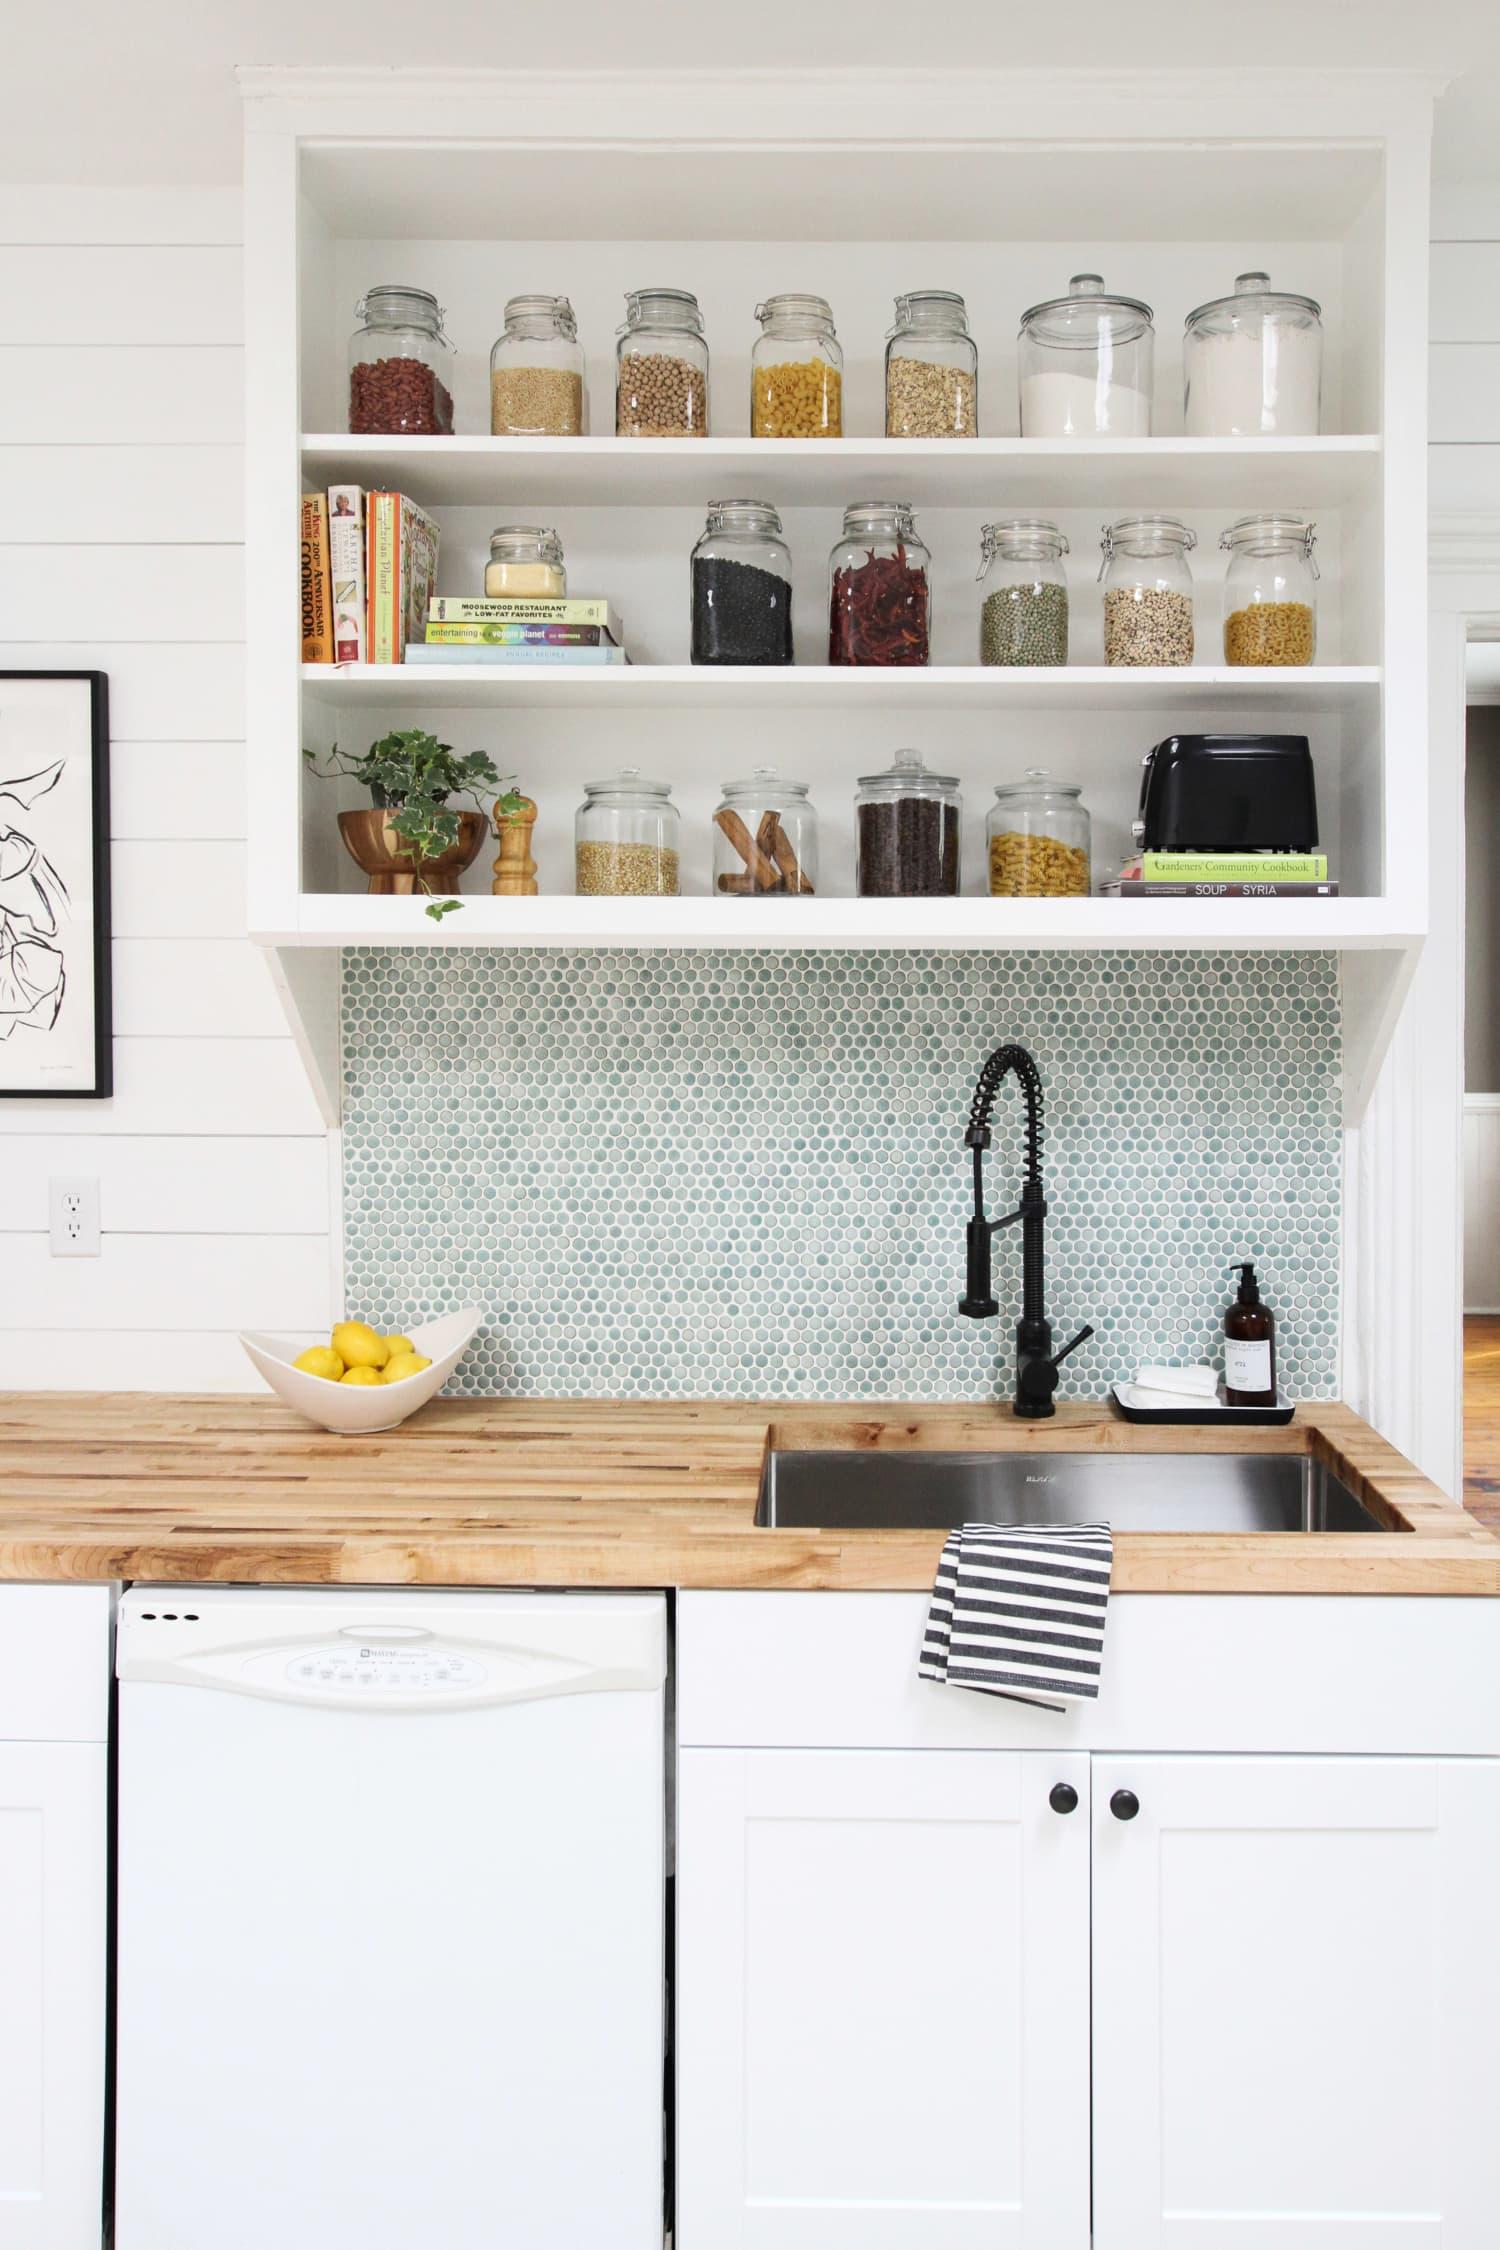 How To Grout a Tile Backsplash Like a Pro